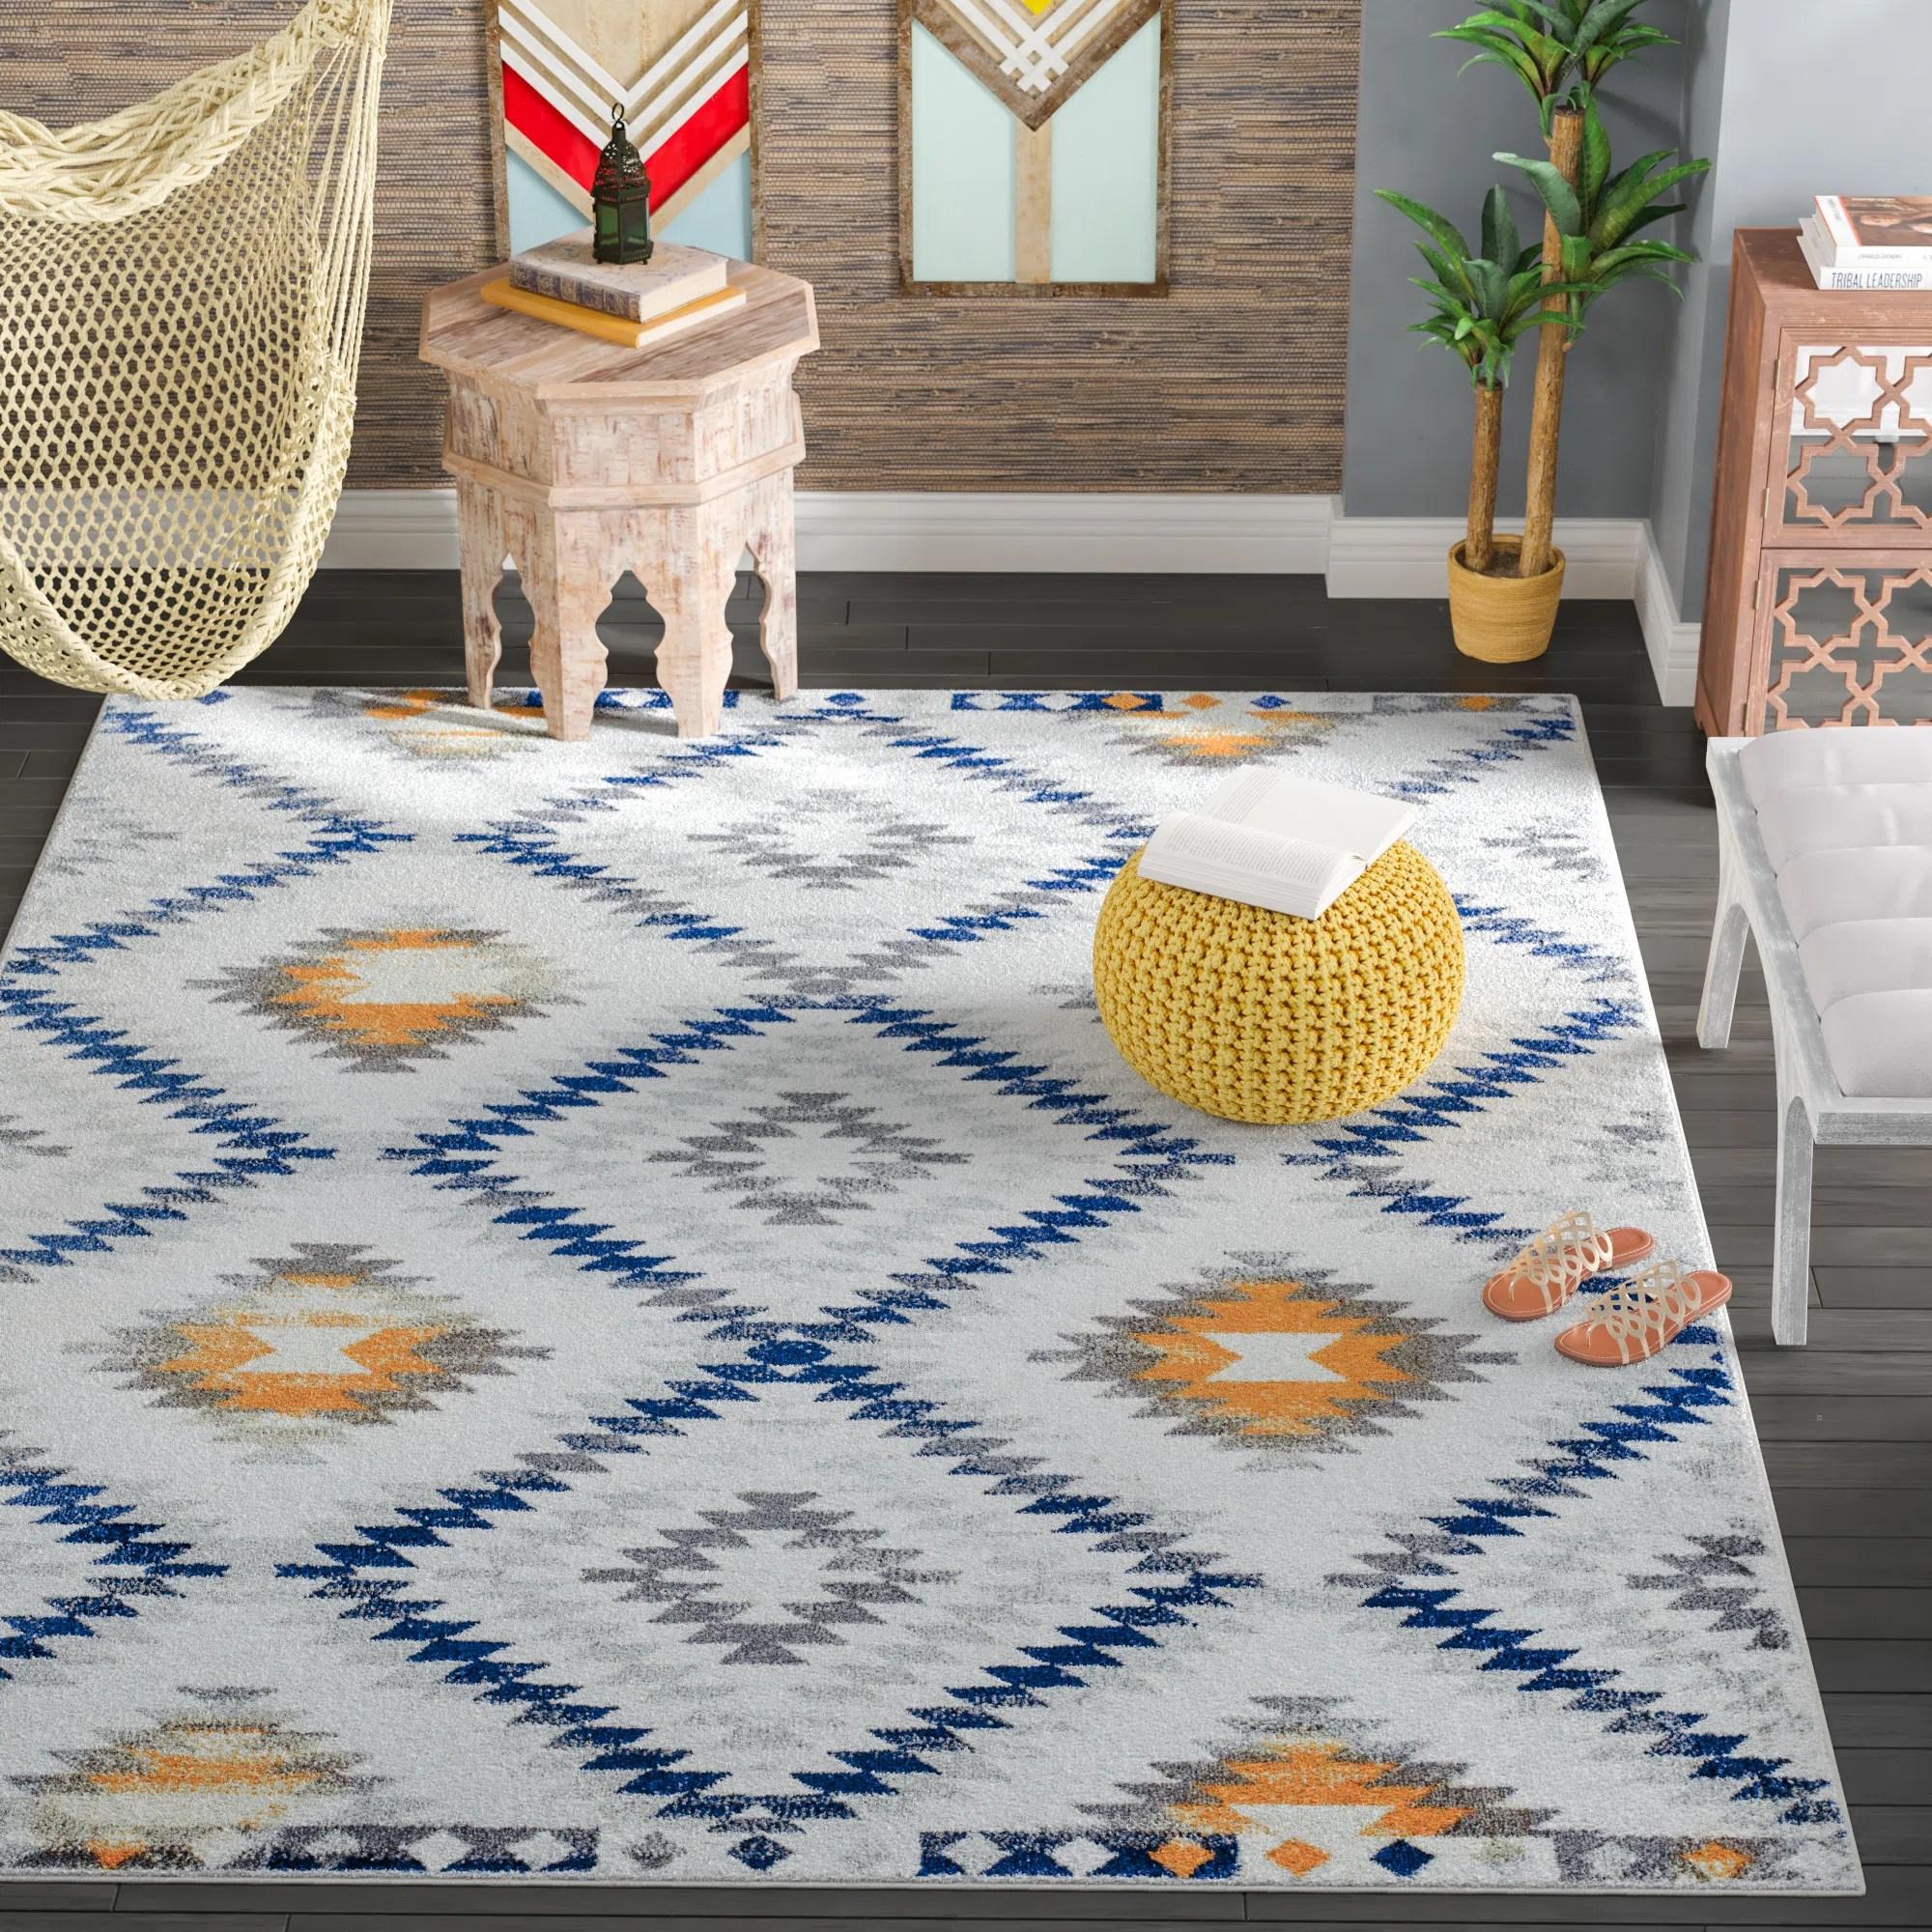 Cosmoliving By Cosmopolitan Southwestern Ivory Blue Yellow Area Rug Reviews Wayfair Ca